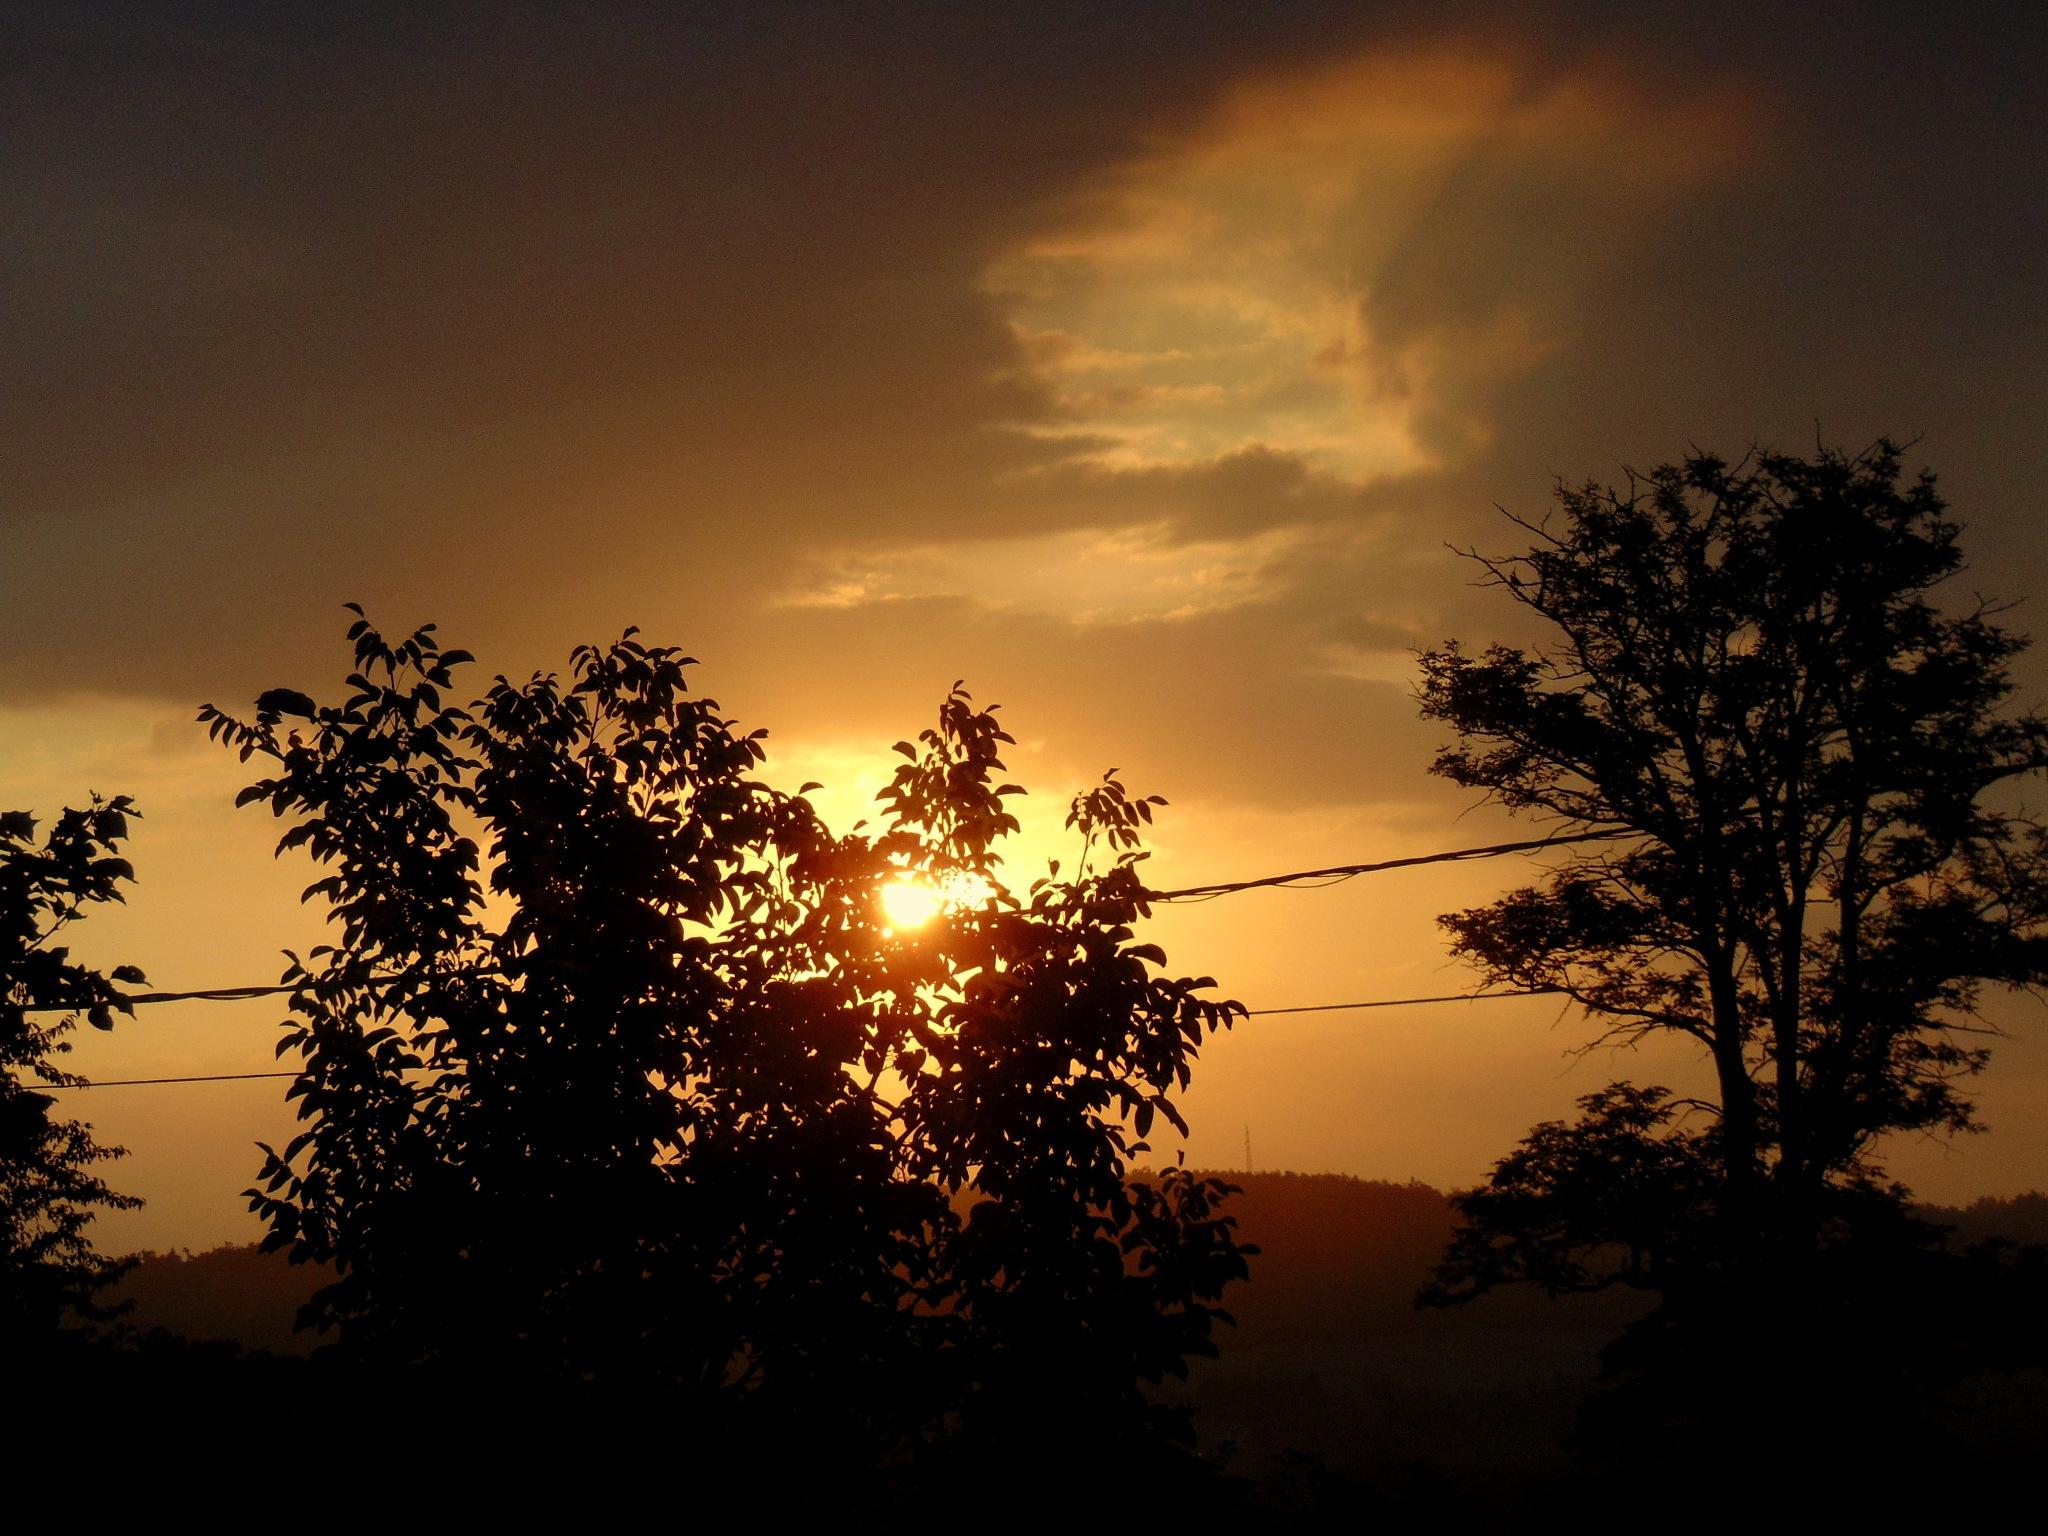 Morning, sunshine by Stefani